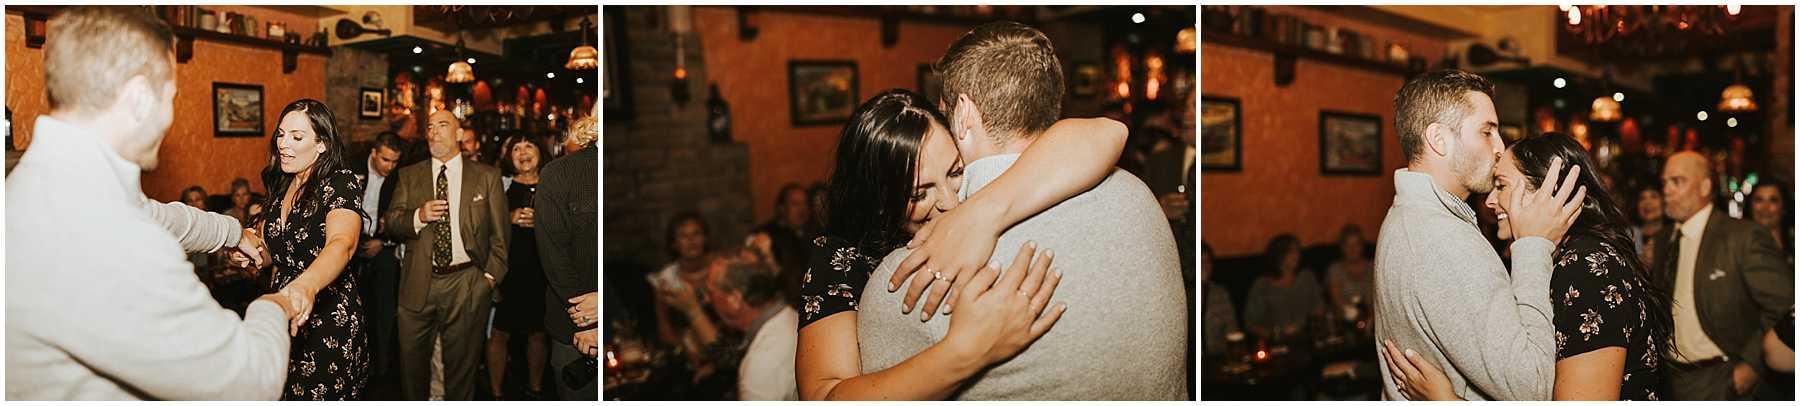 Ireland_Intimate_Wedding_Anni_Graham_0078.jpg